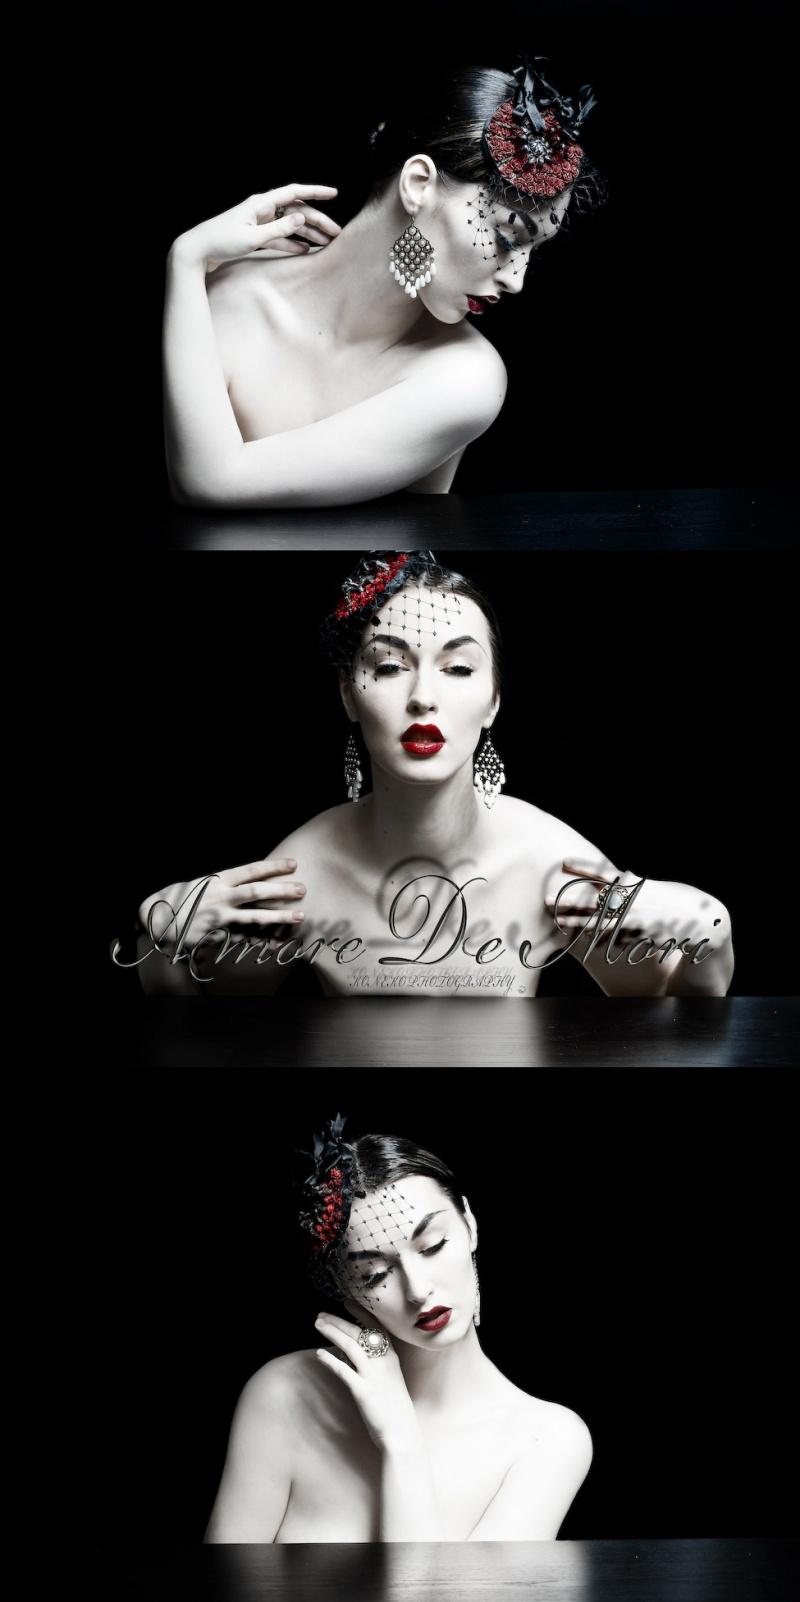 Mar 26, 2009 Model Koneko, shot by herself in Amore de Mori tarantula fascinator